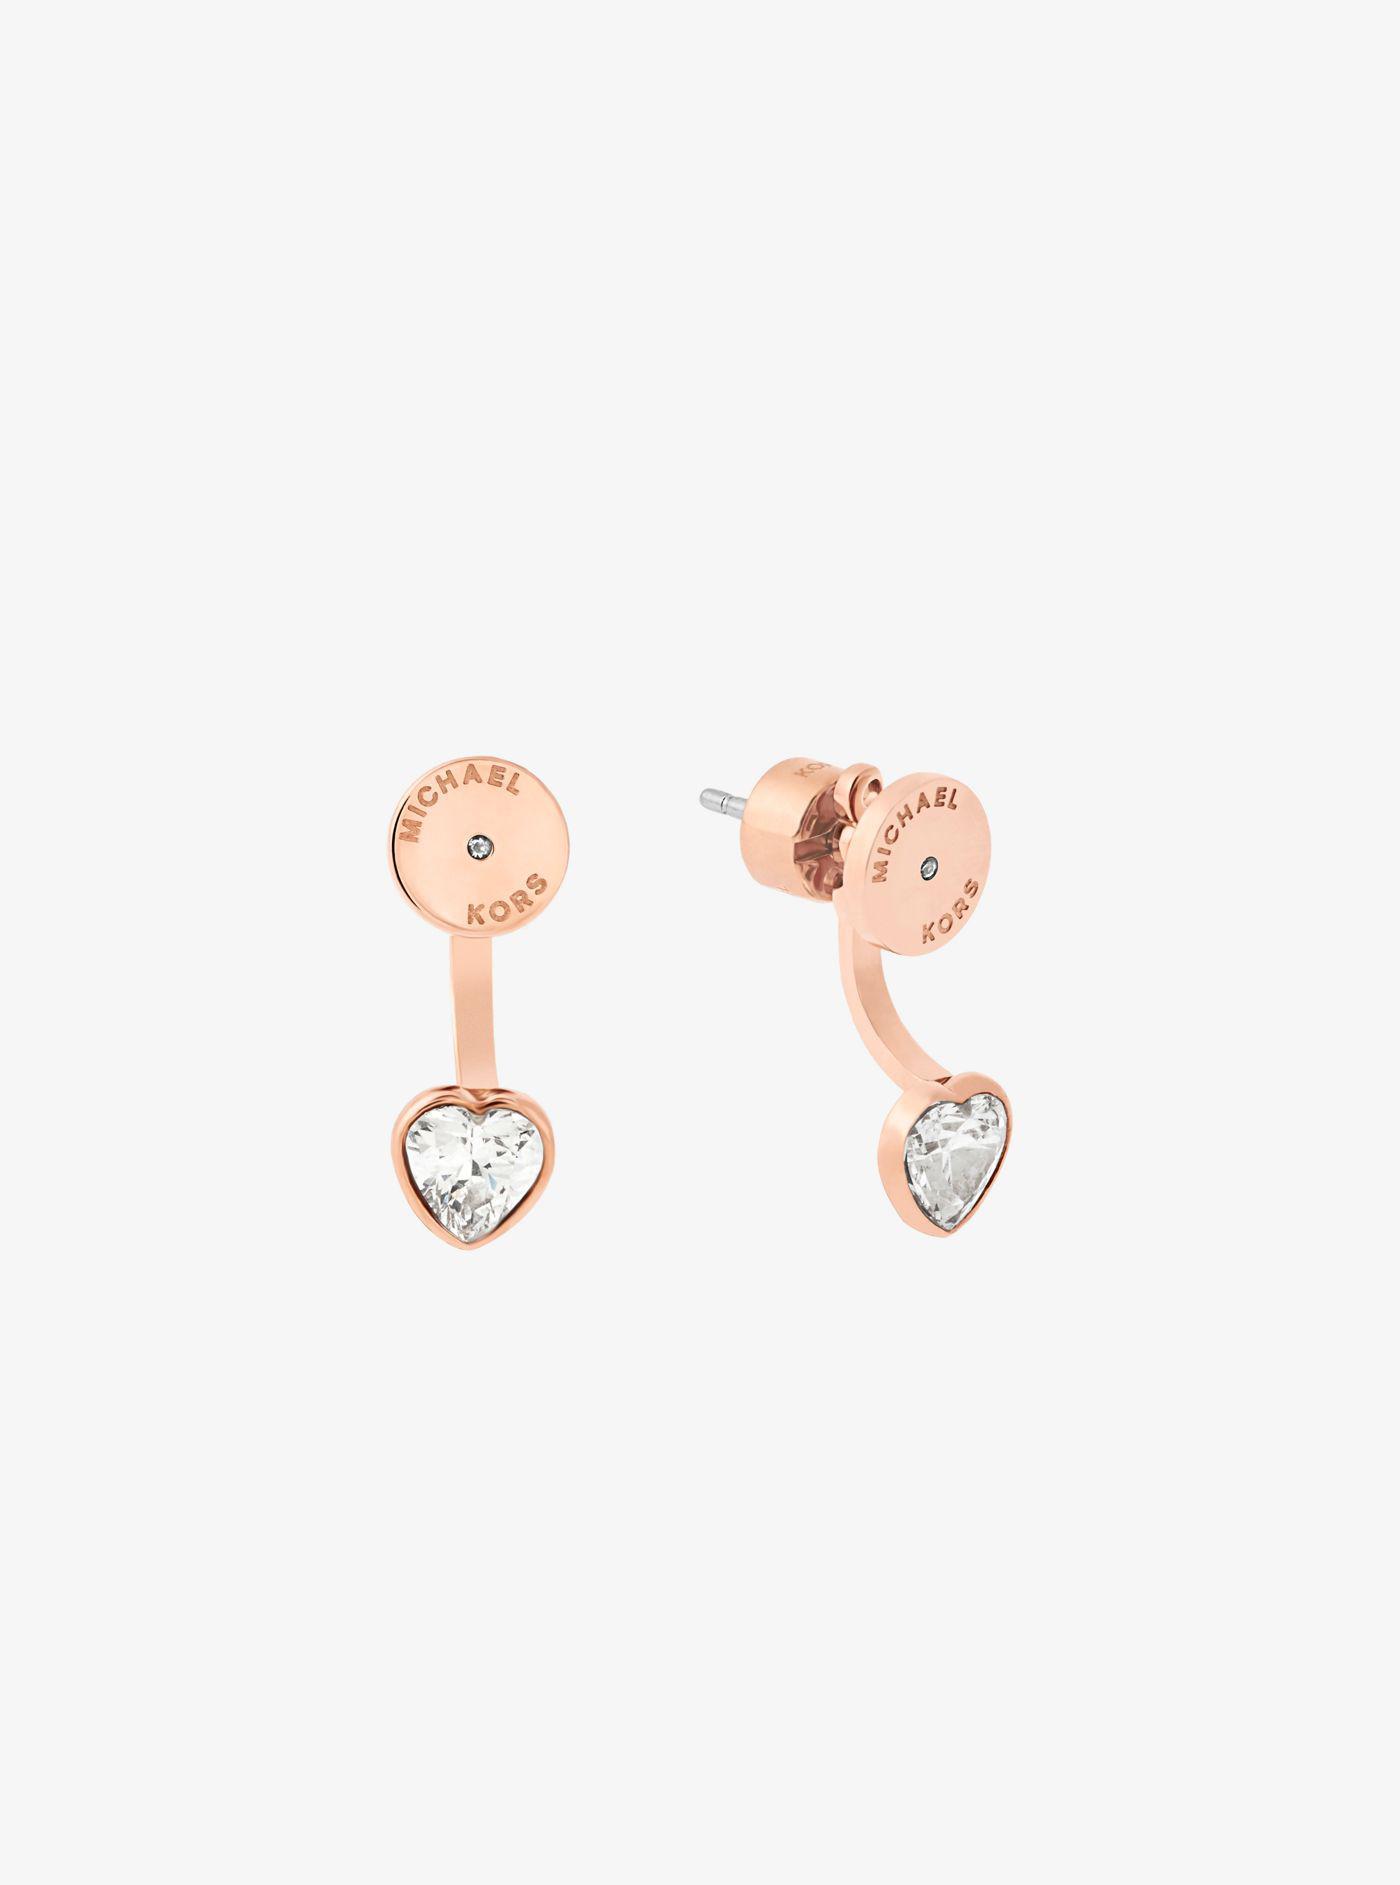 693affdc1b43 Michael Kors Rose Gold Tone Heart Drop Earrings - Best All Earring ...